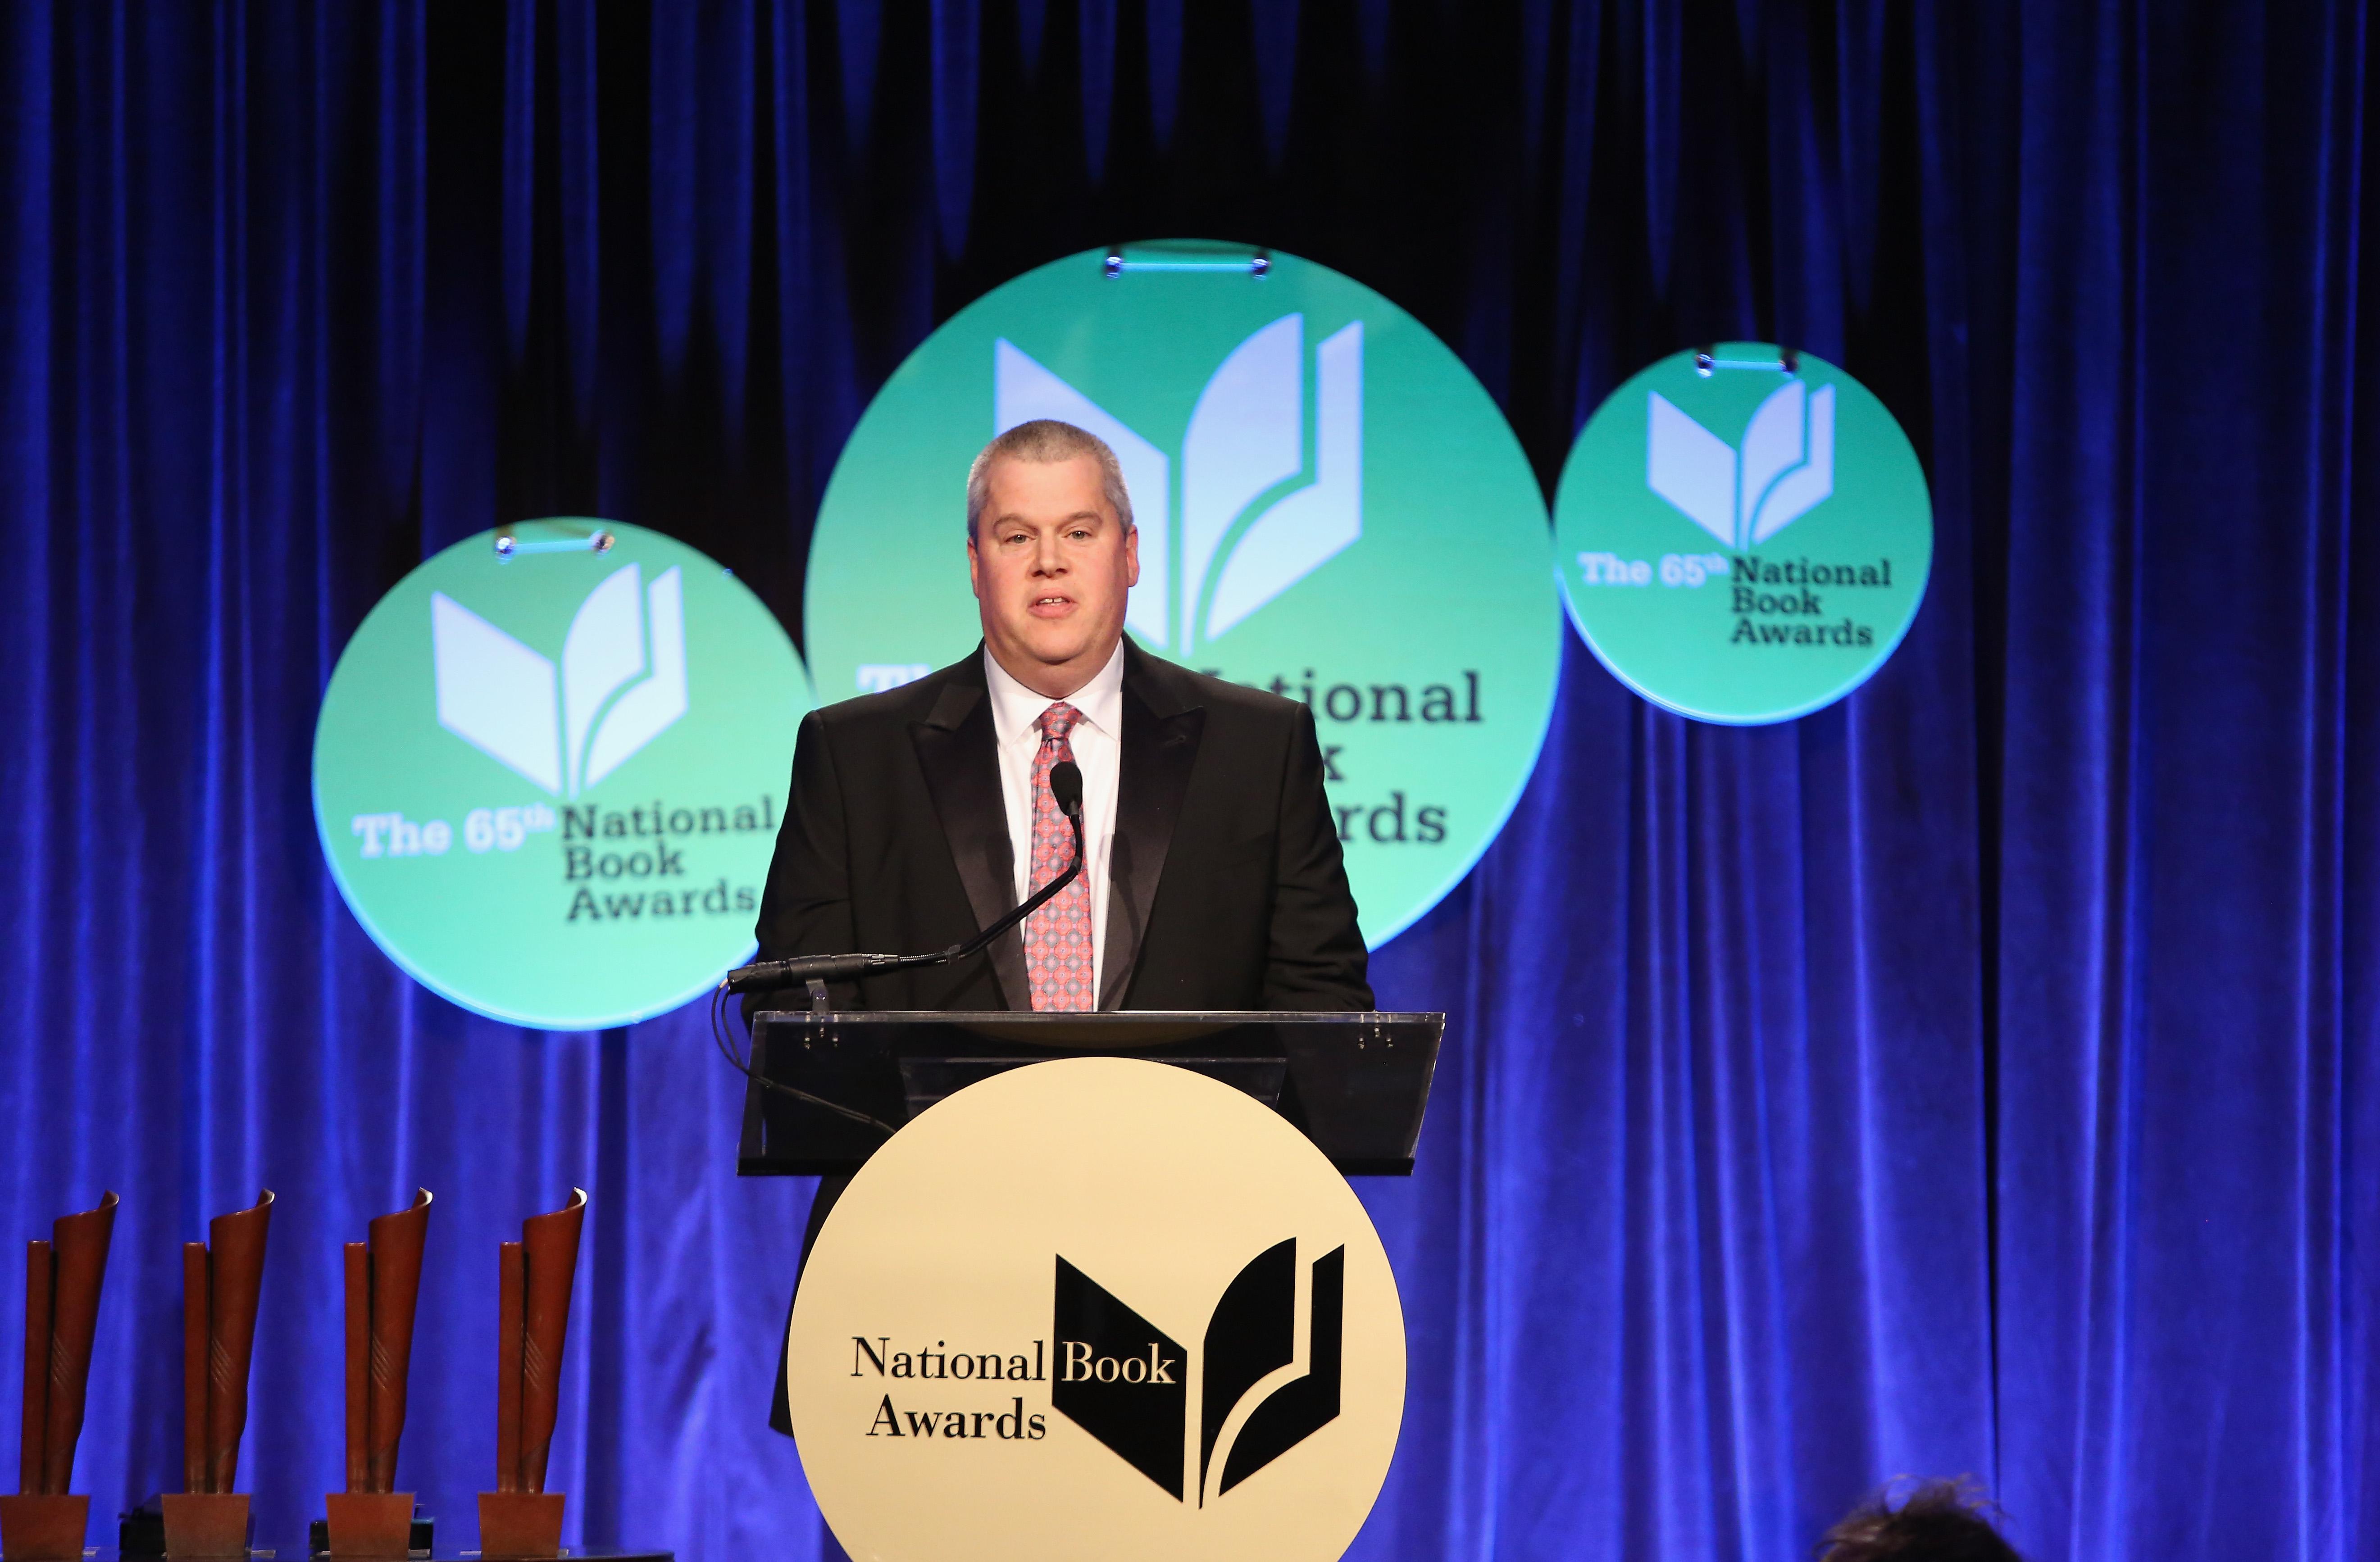 Daniel Handler at the 2014 National Book Awards on Nov. 19, 2014 in New York.